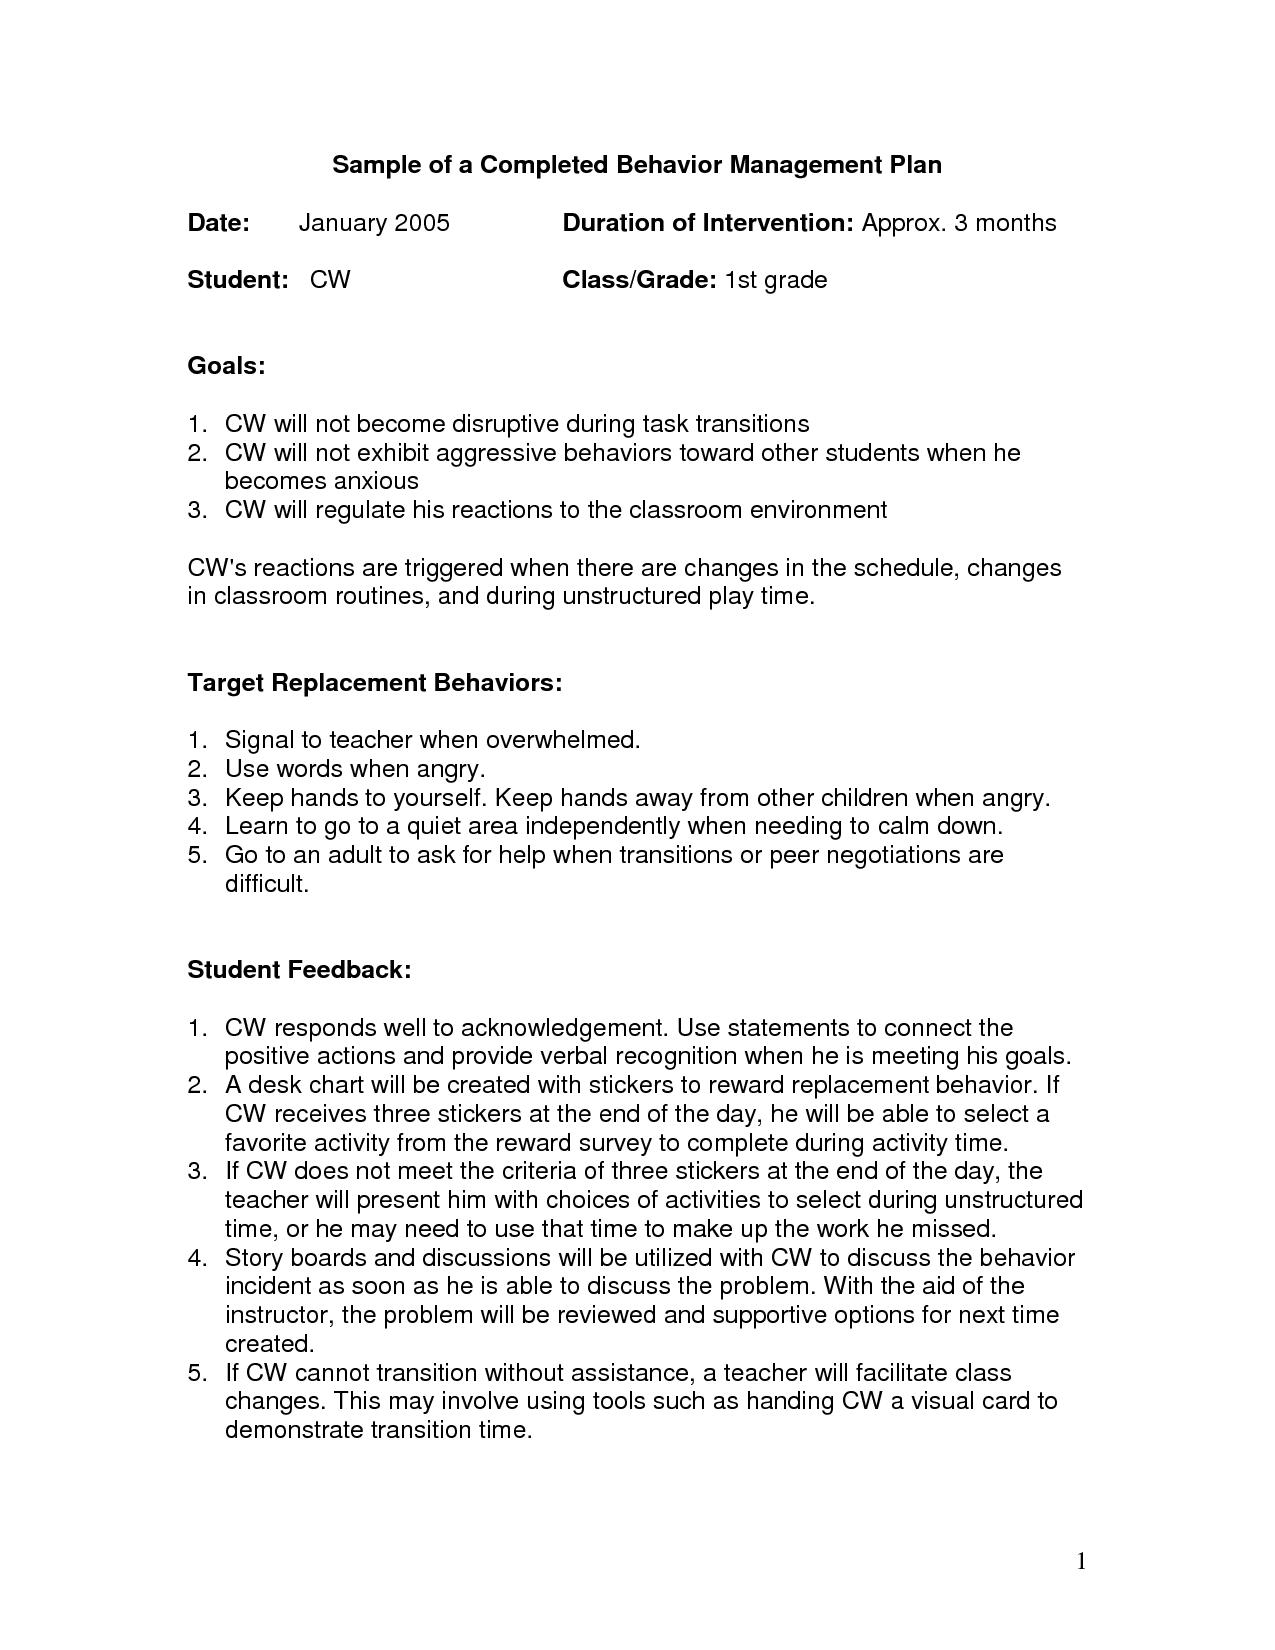 Sample High School Behavior Plan